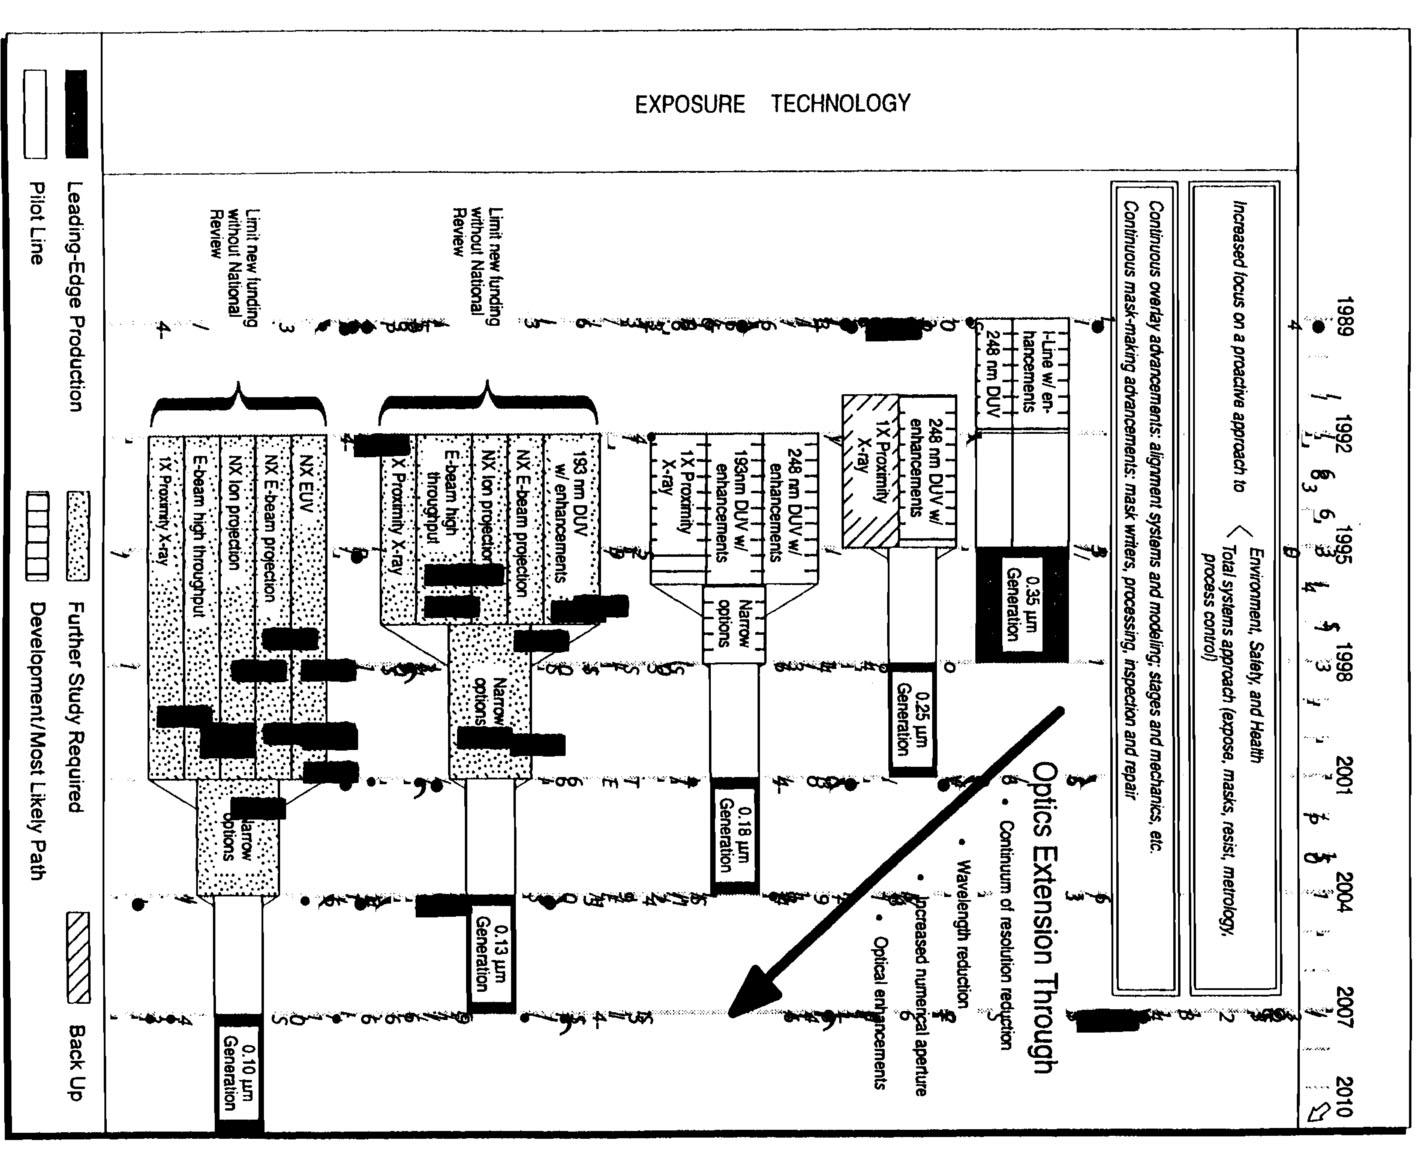 Future Lithography Technology X Ray Figure 13